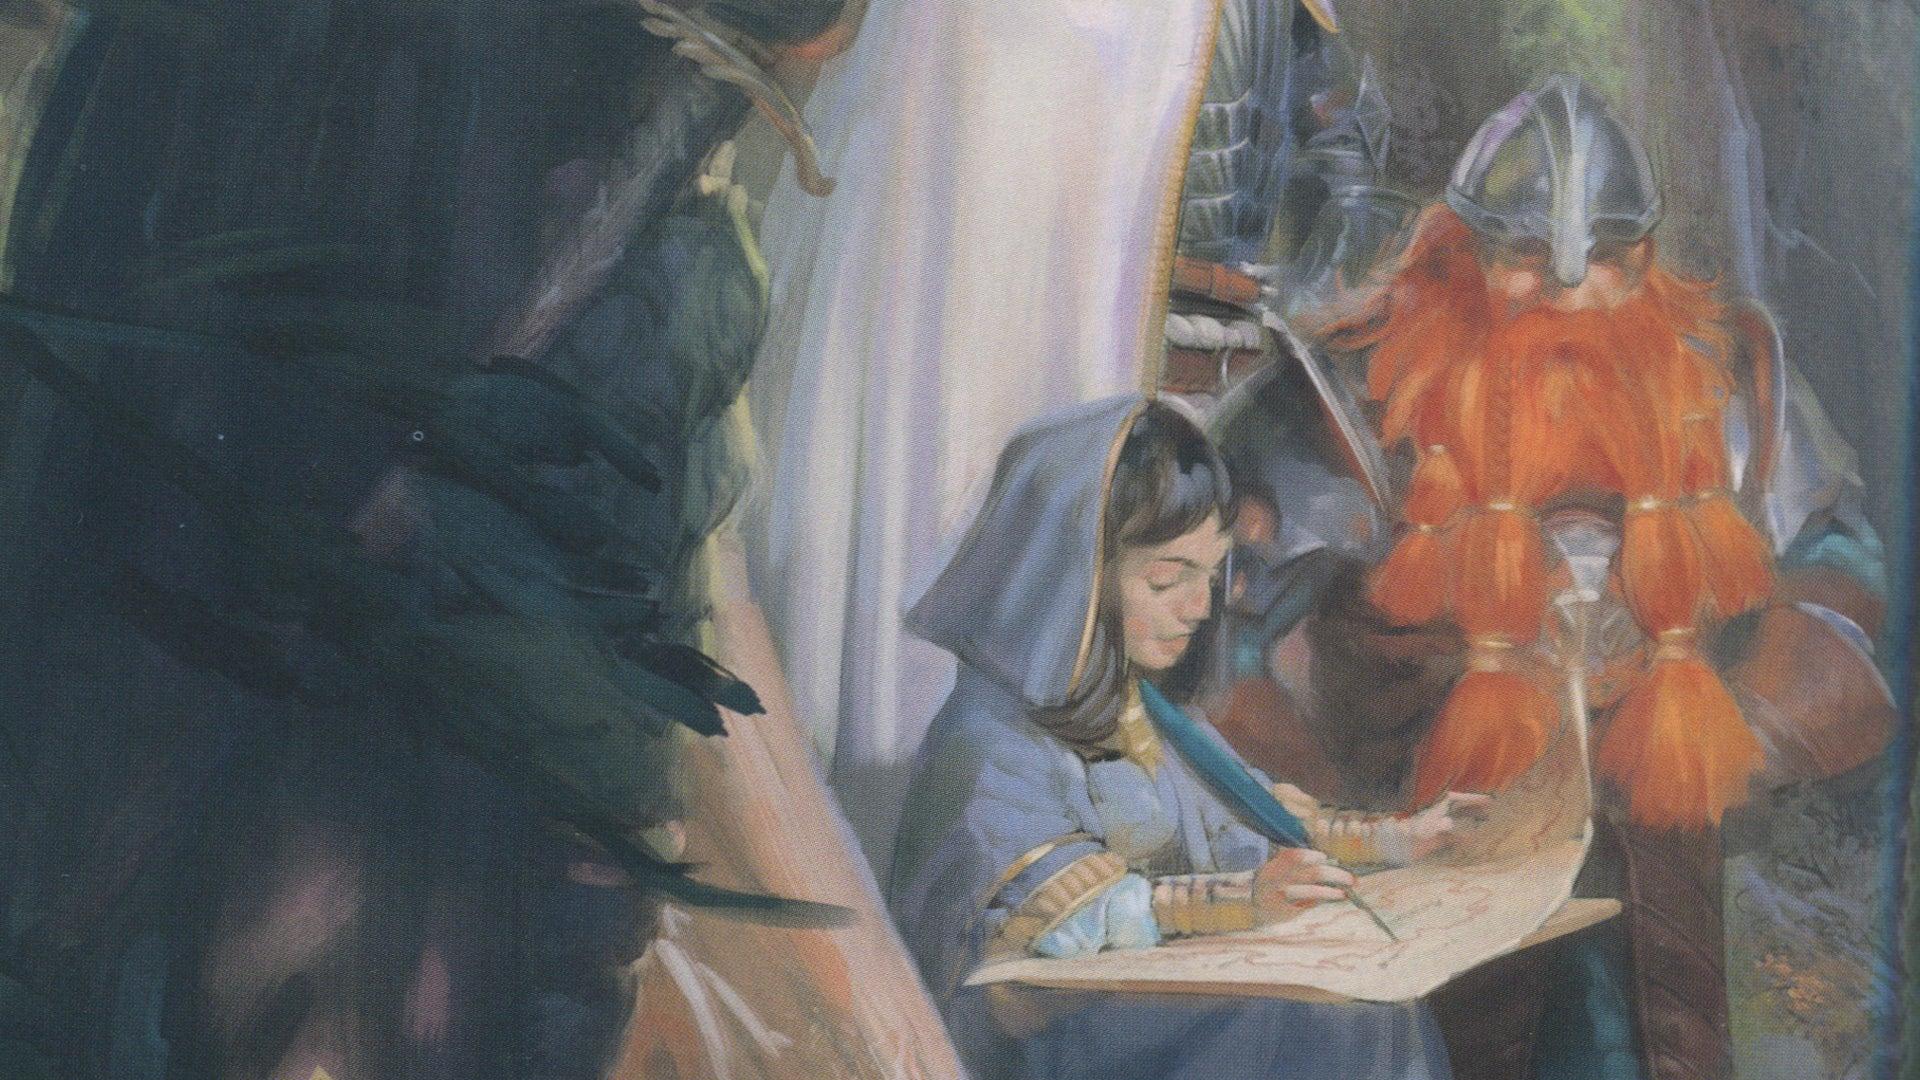 Dungeons & Dragons 5e Players Handbook artwork 9